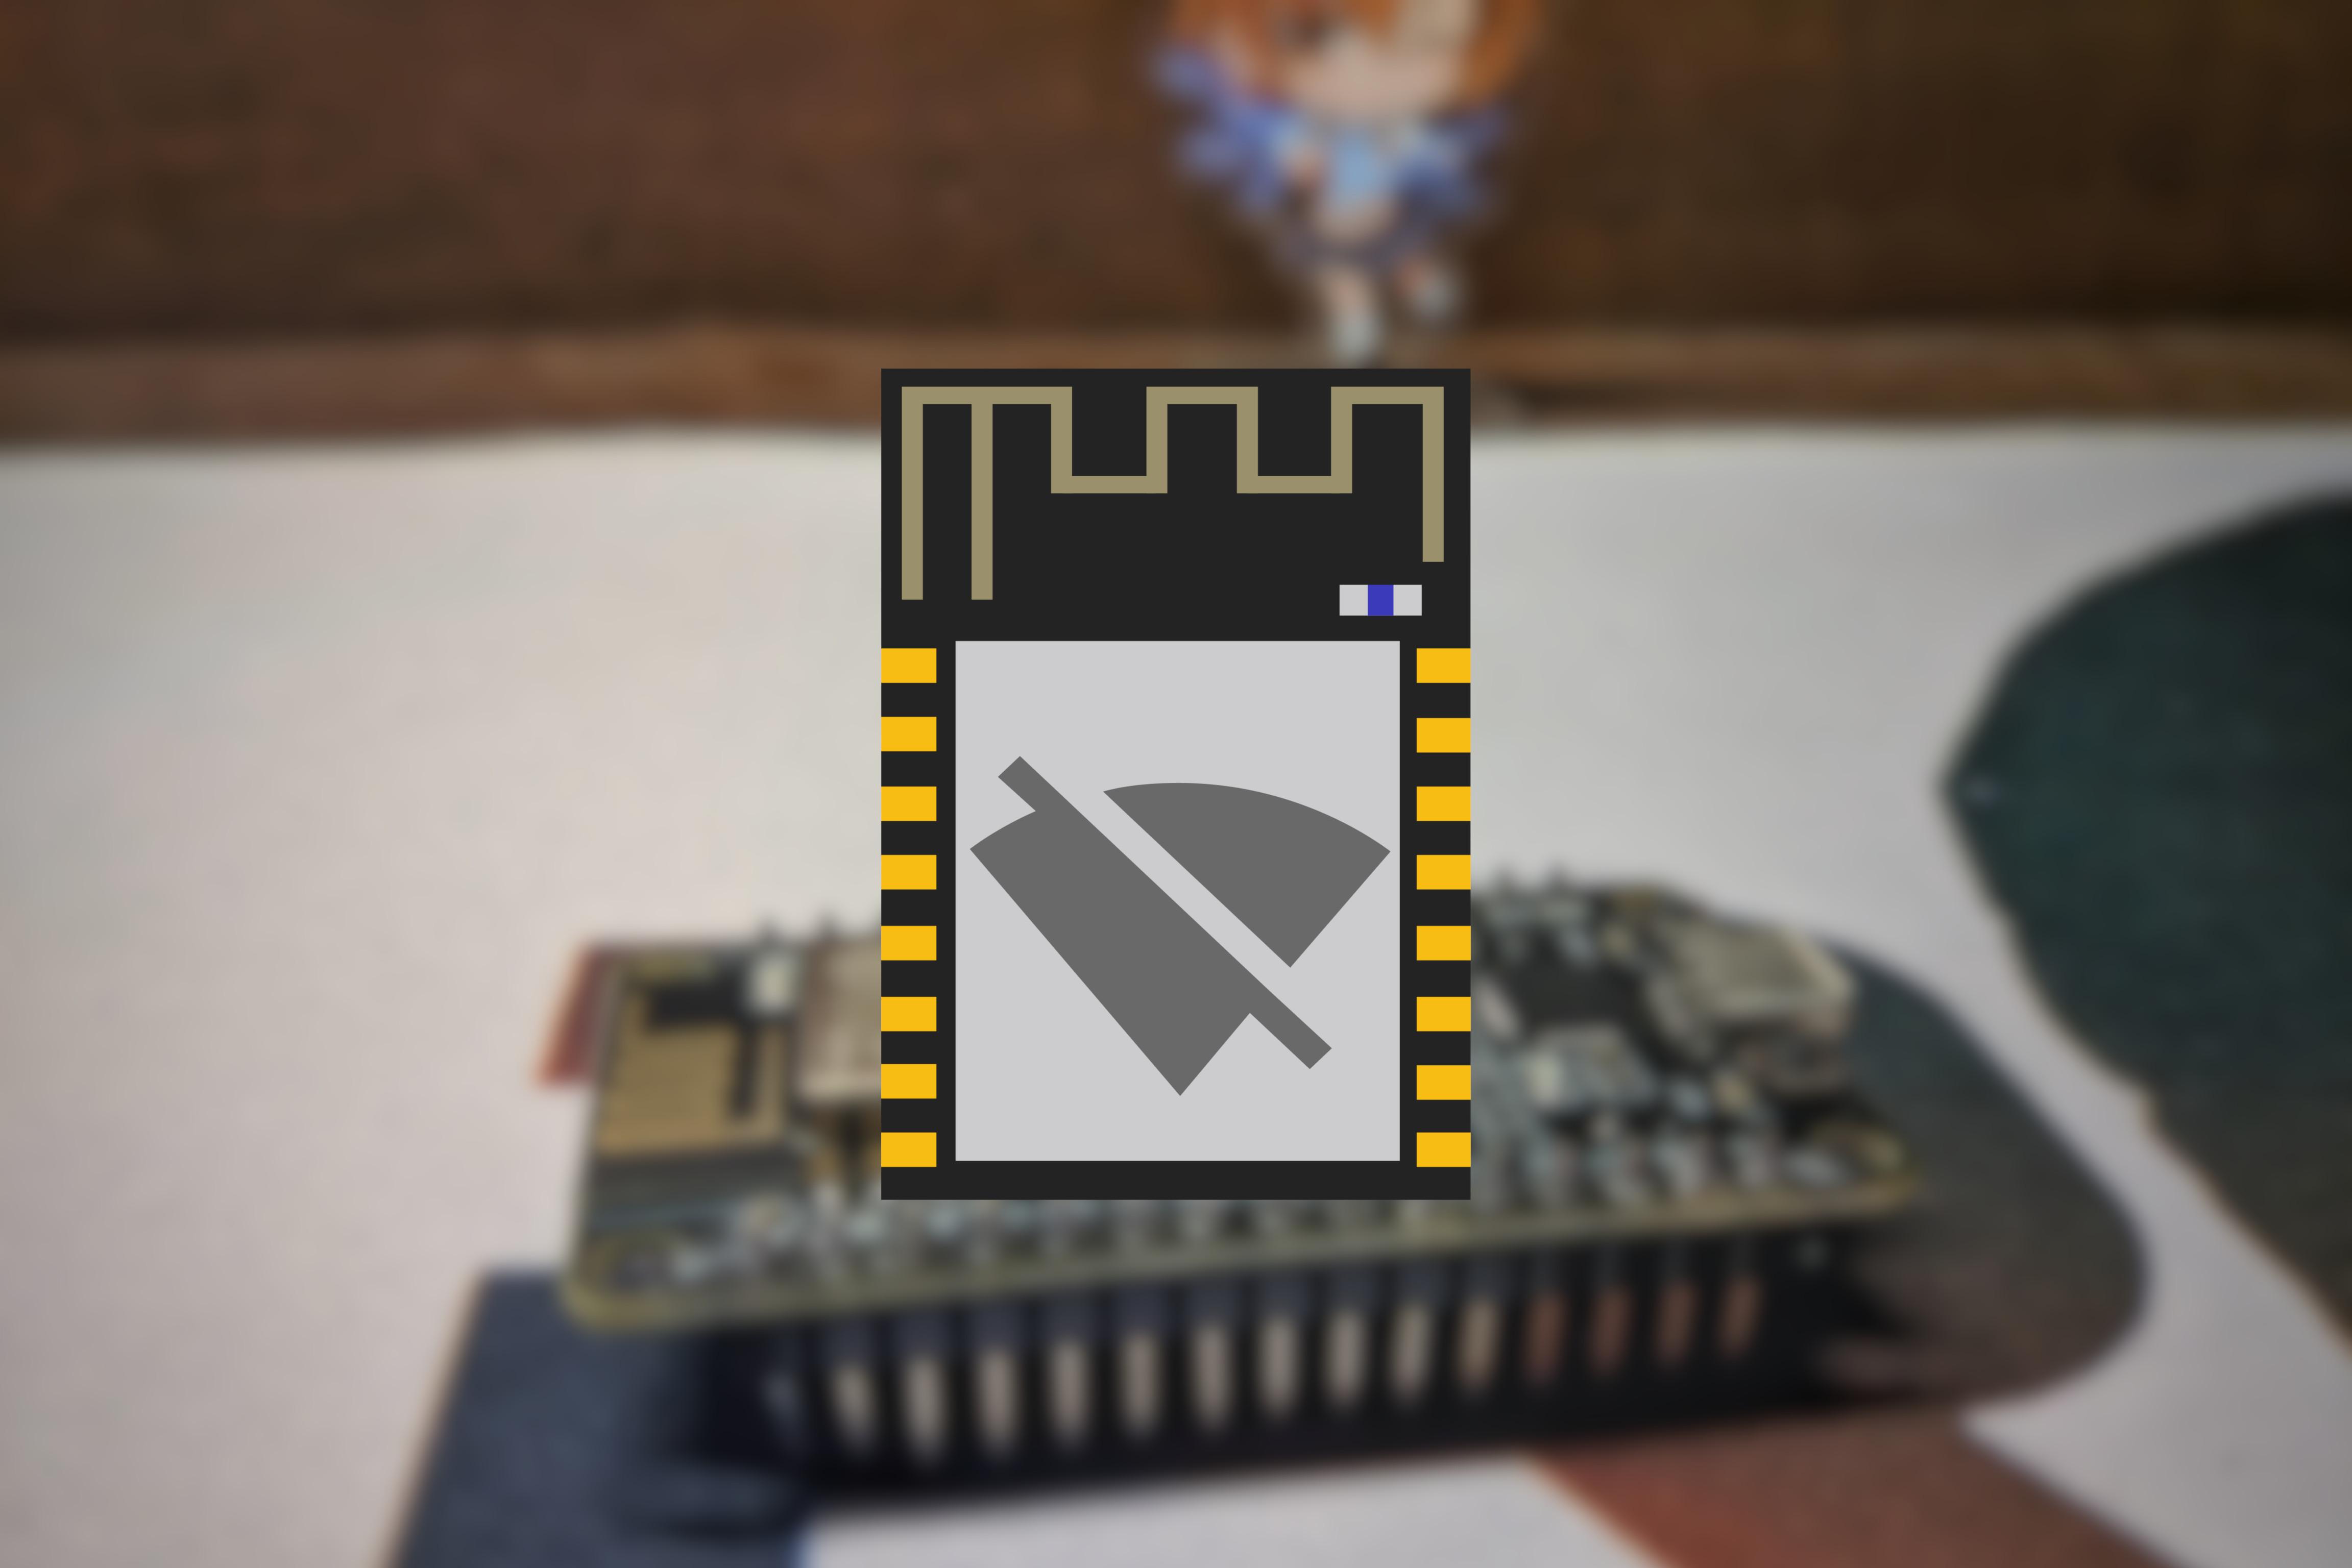 ESP8266 开发板 刷入 Deauther 并用于攻击测试